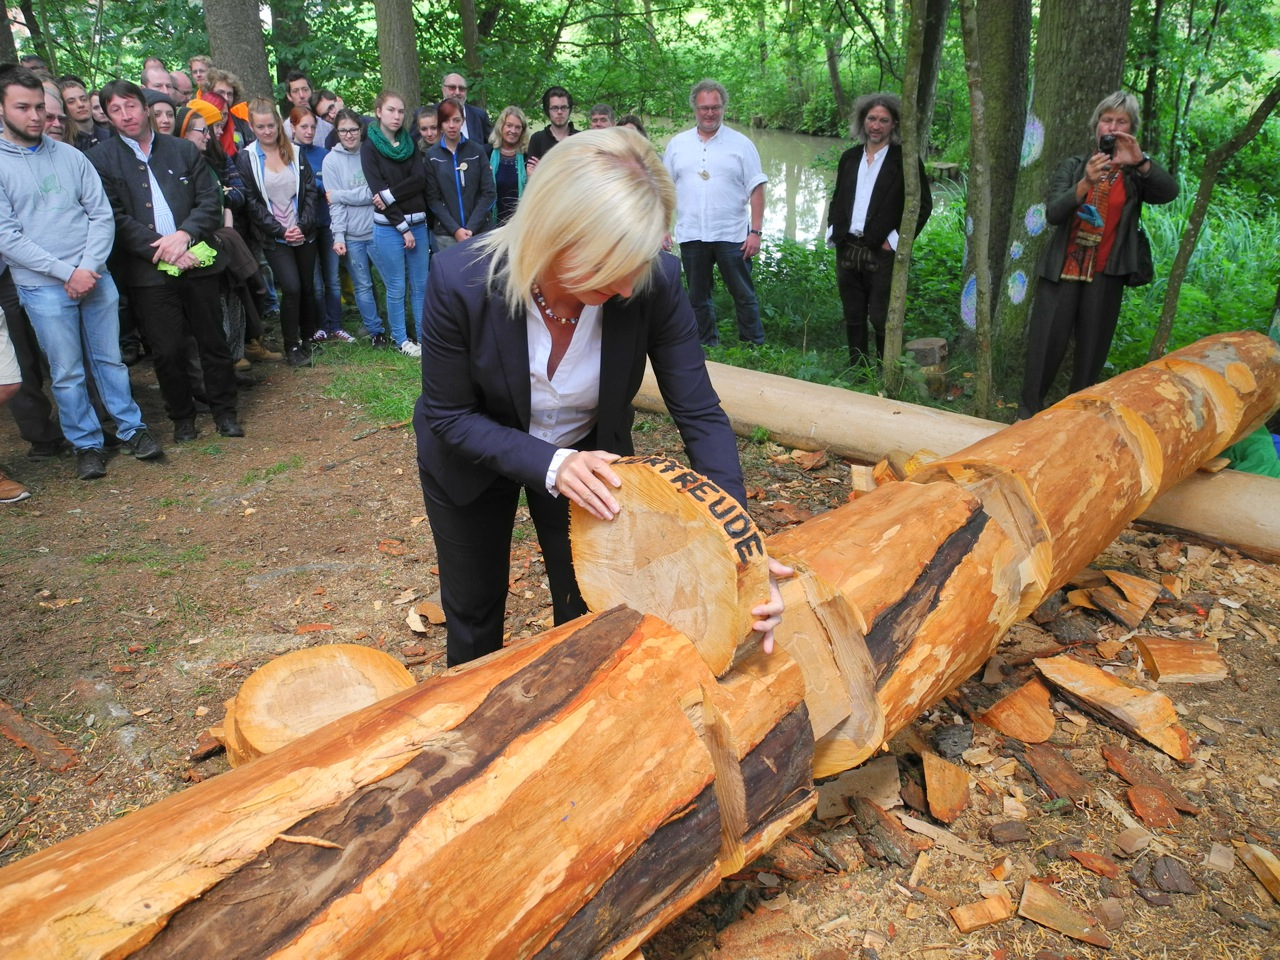 Damalige Umweltministerin Scharf bei 20 Jahre FÖJ